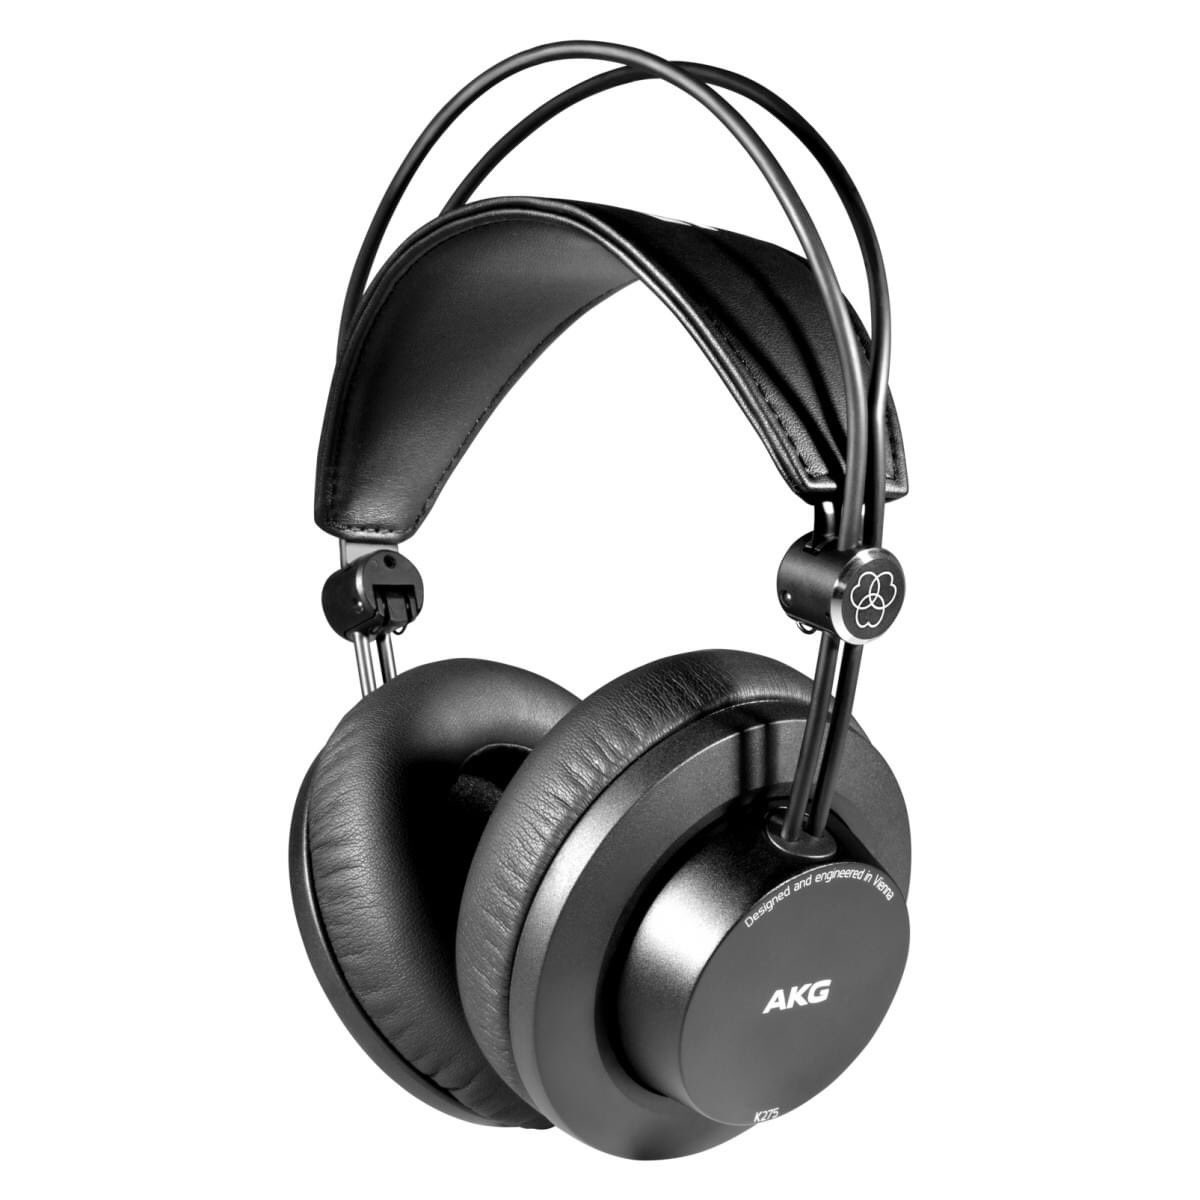 :::AKG  #K275 #Headphones  16Hz - 28KHz. audifonos dinamicos stereo.  -20% de DESCUENTO: $208,13 +Envío totalmente GRATIS.  Contact: 0979125101  #QuedateEnCasa #CuarentenaTotal #musician #Masmusika #Quito #Guayaquil #Cuenca #Machala #Ambato #Manta #4May #Ecuador #AKG #Audifonos https://t.co/qsODICW7GV